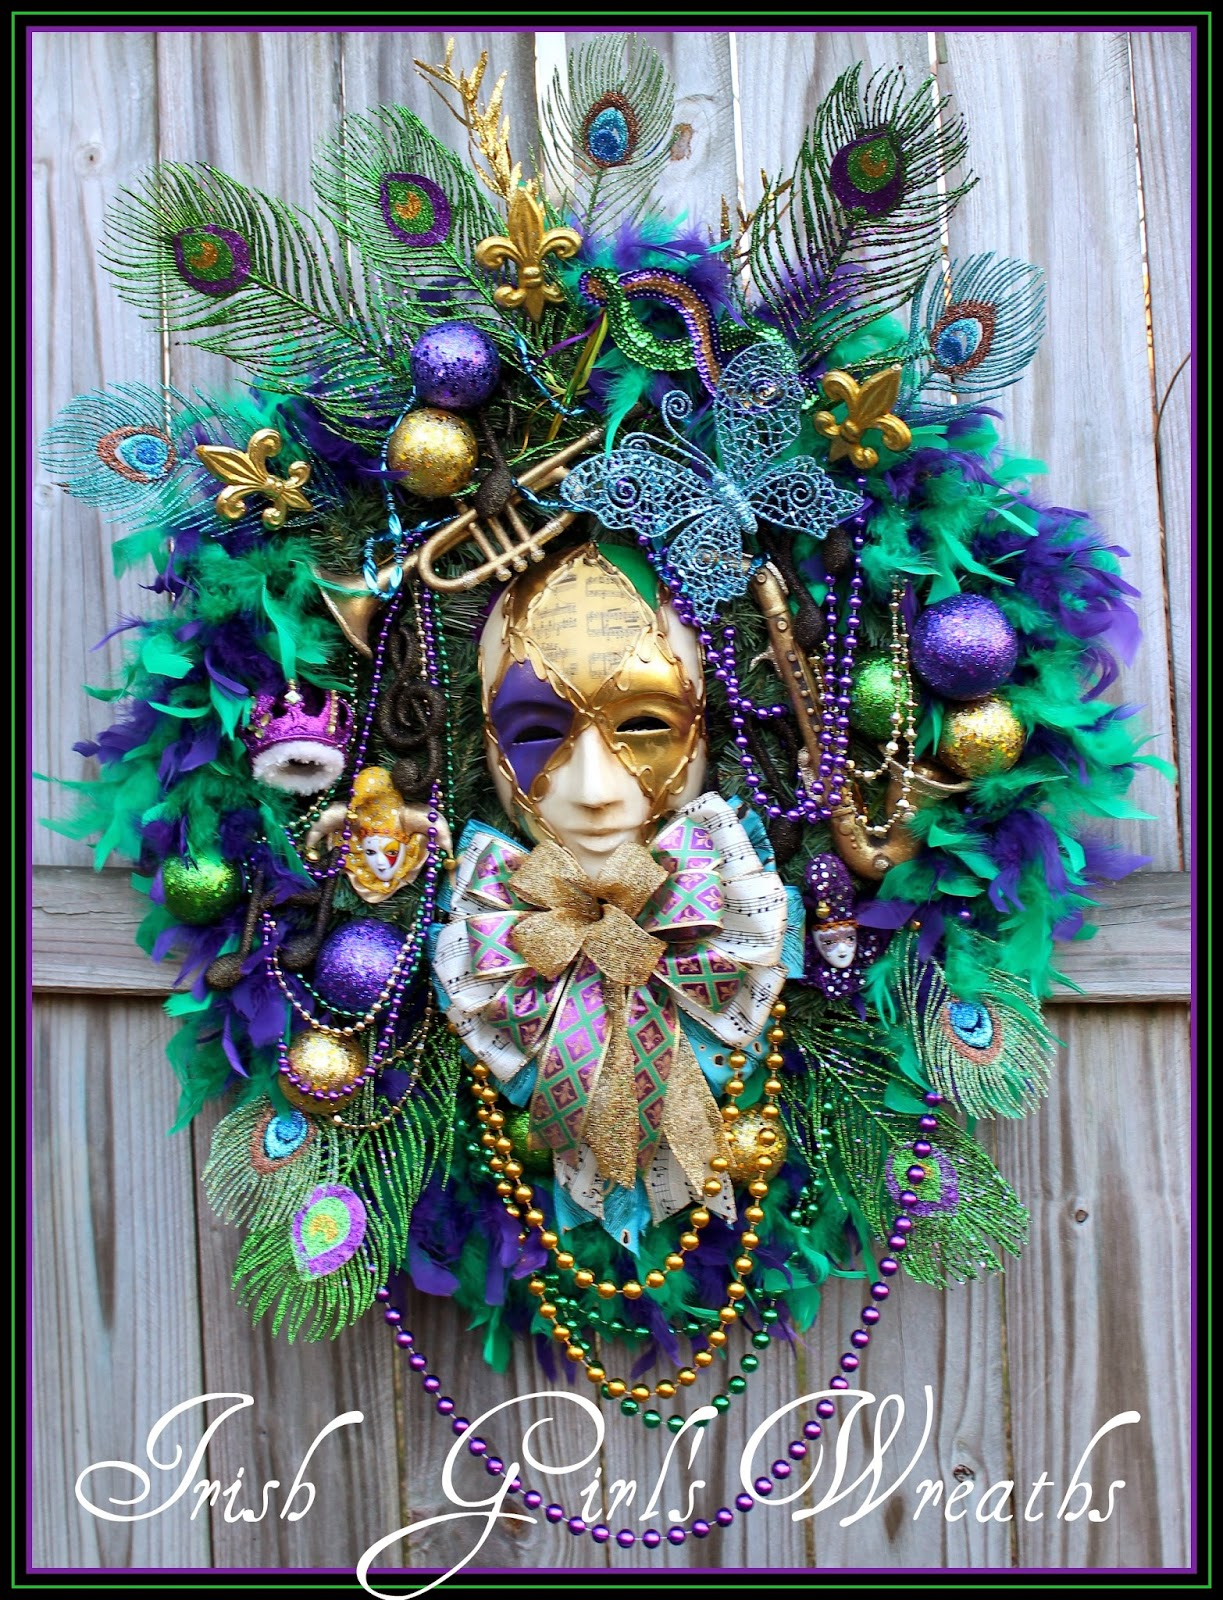 Music Man Birthplace of Jazz Mardi Gras Wreath